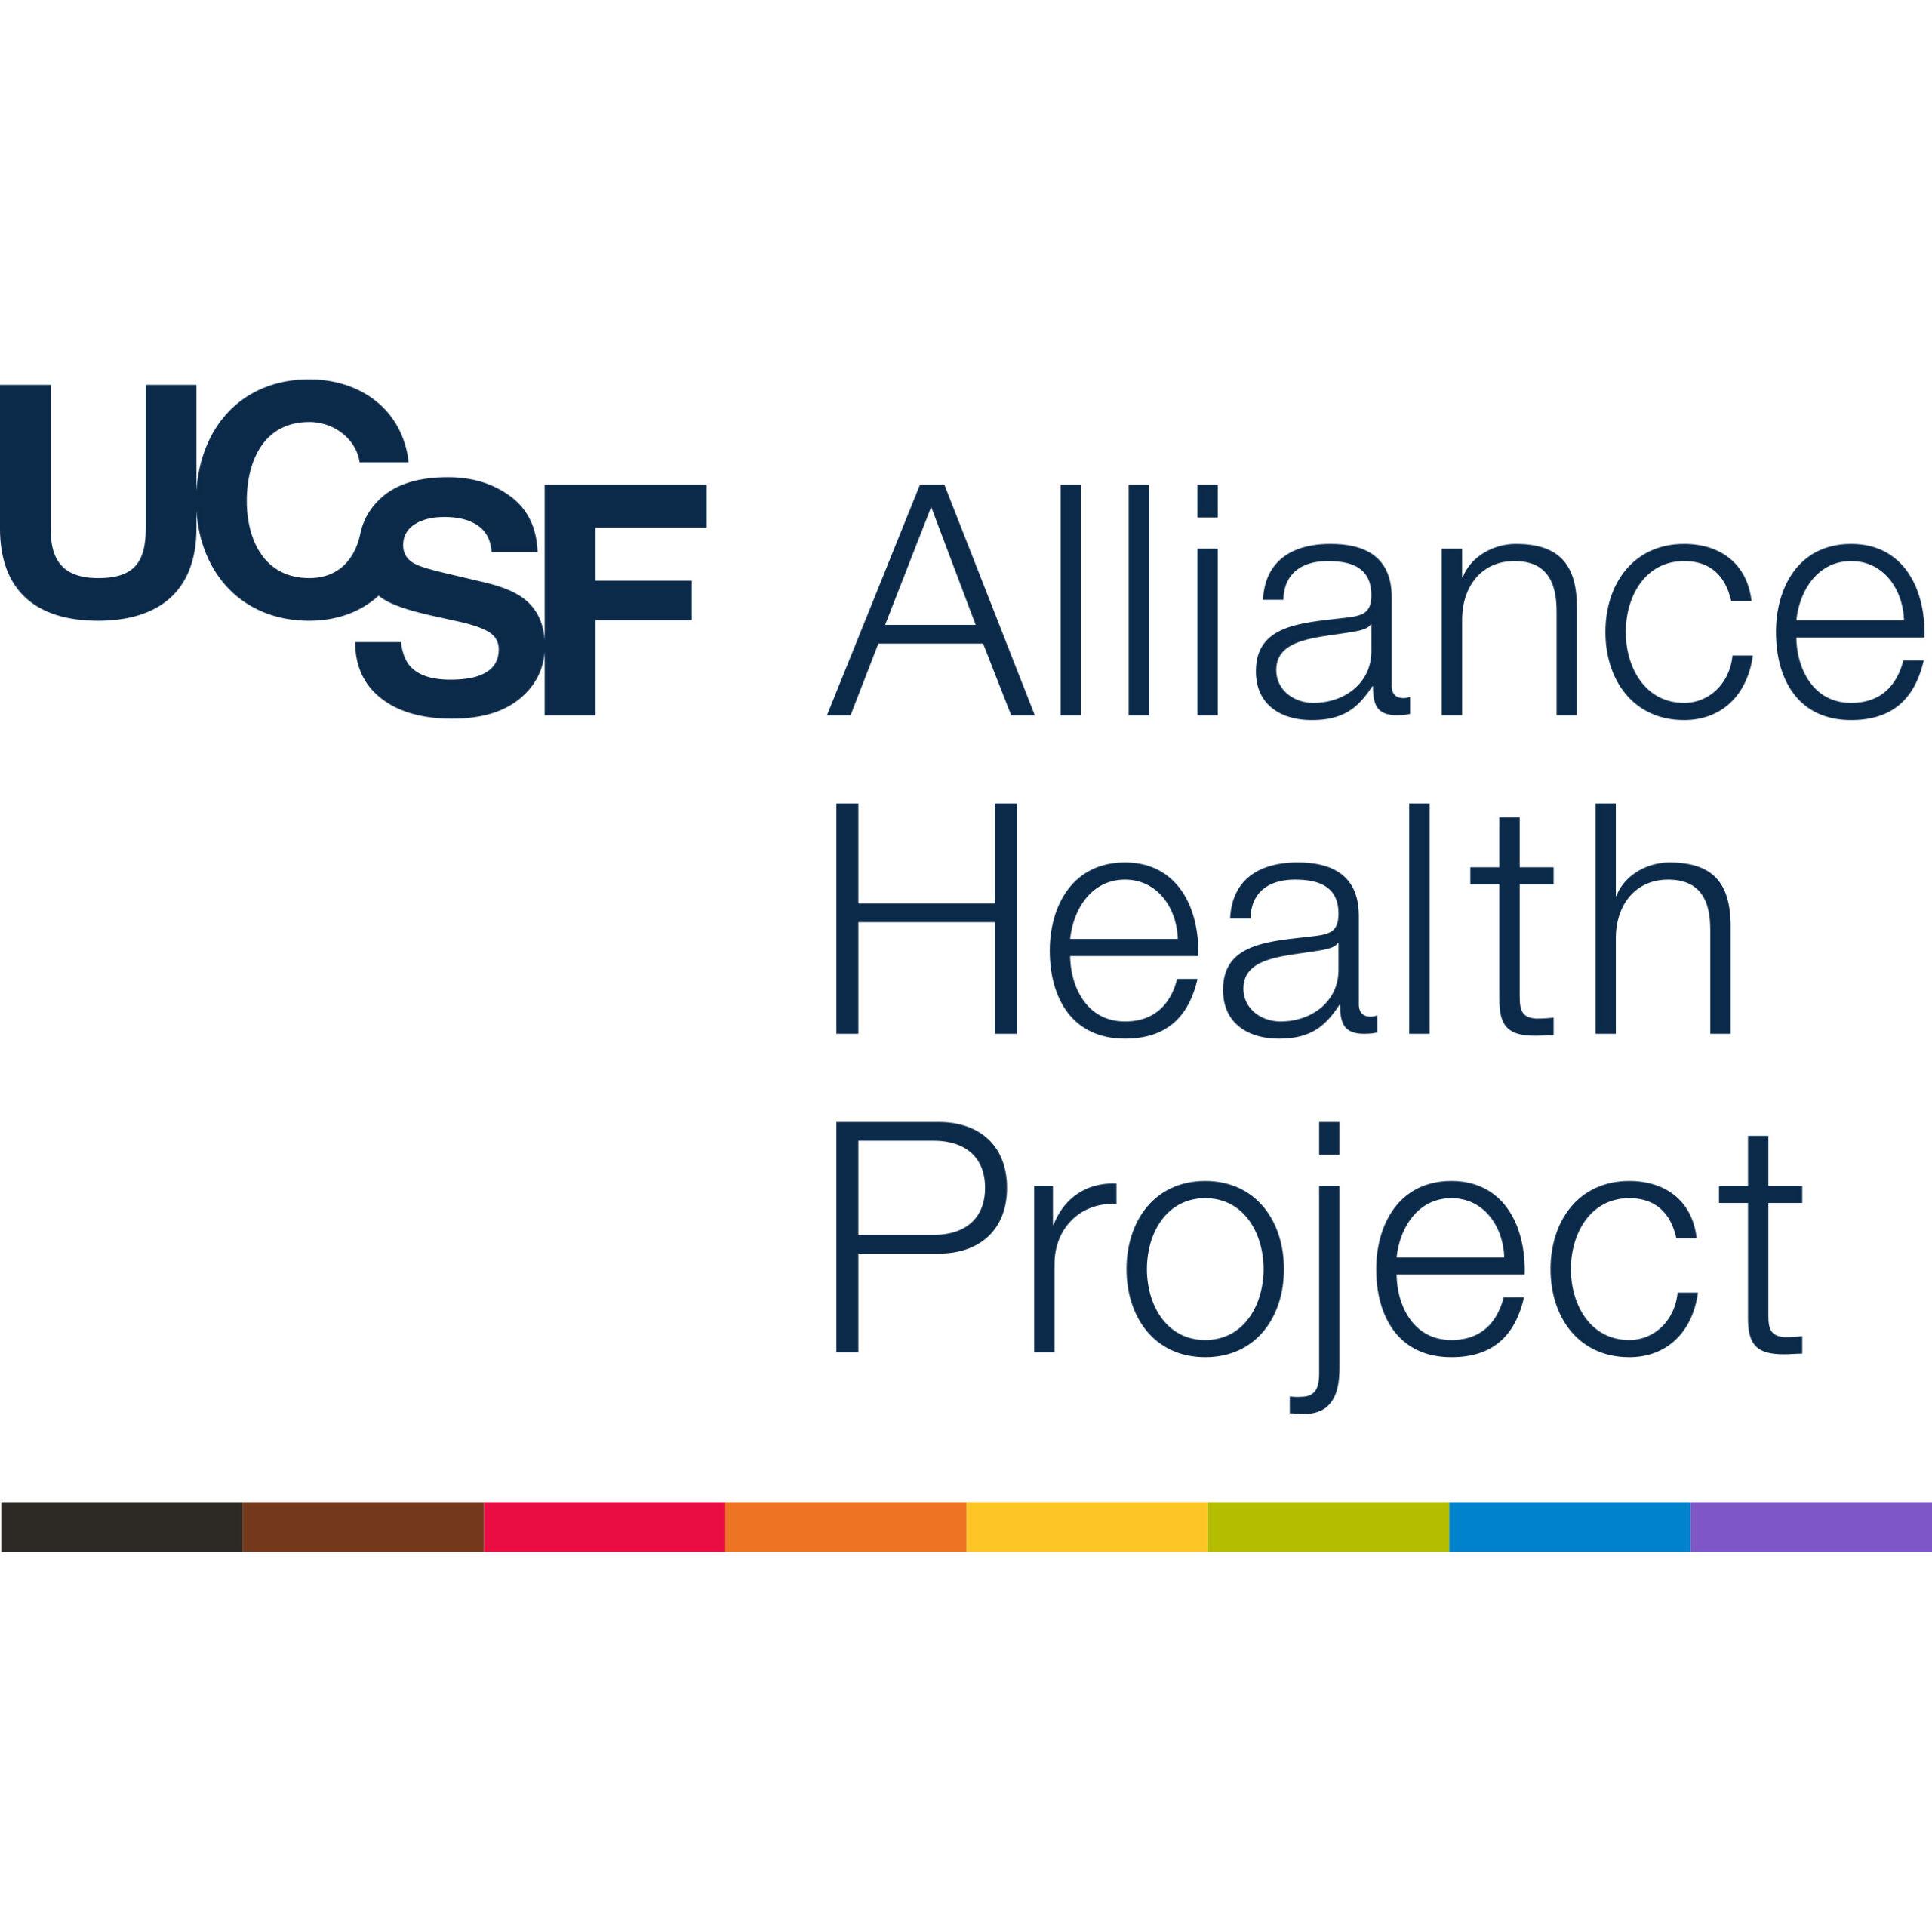 UCSF Alliance Health Project logo